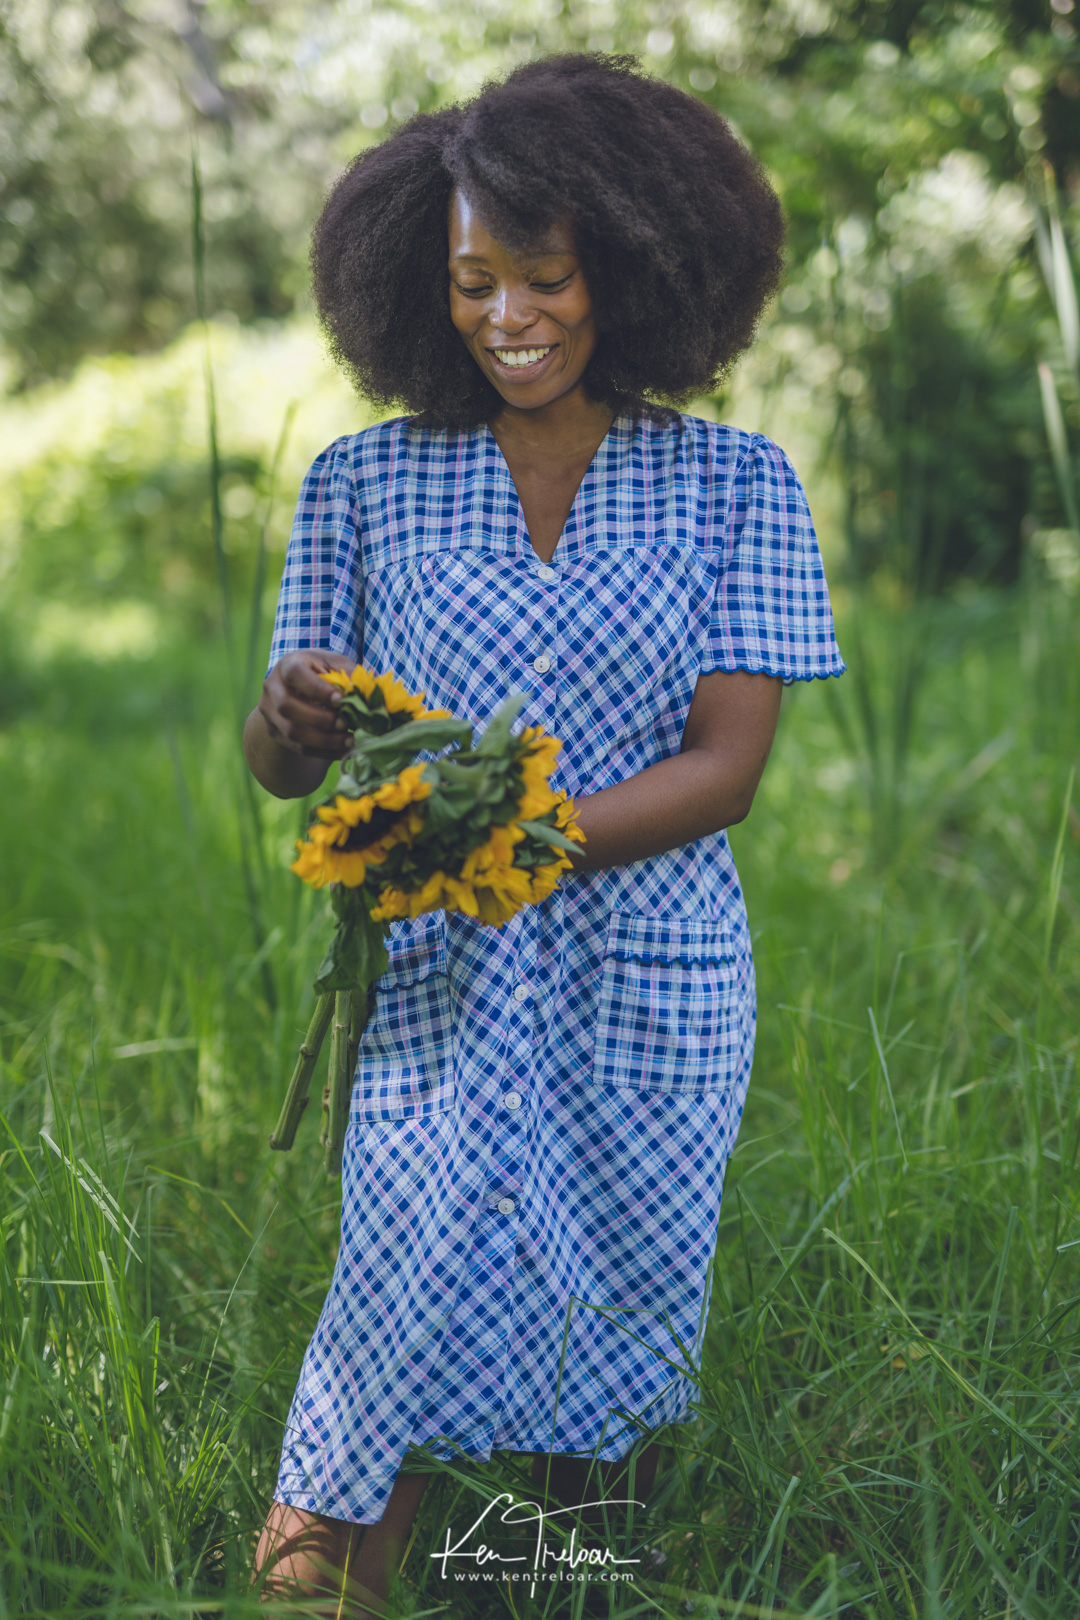 Ken Treloar Photography - Natural L-ight Editorial Portrait Fashion Photo Session - Cape Town Dec 2018-36.jpg